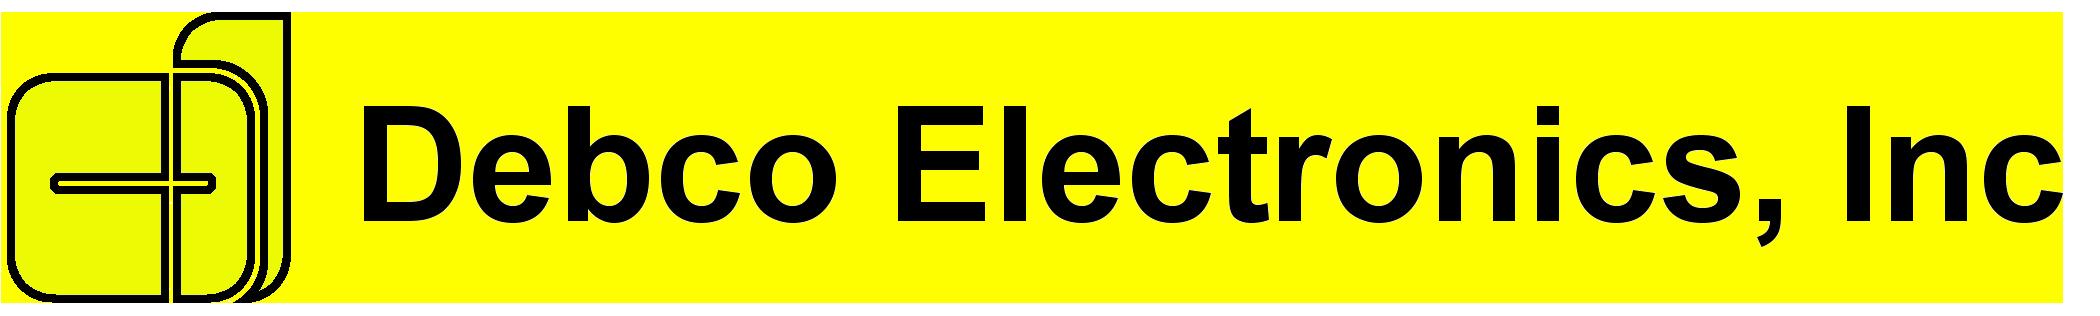 Debco Electronics